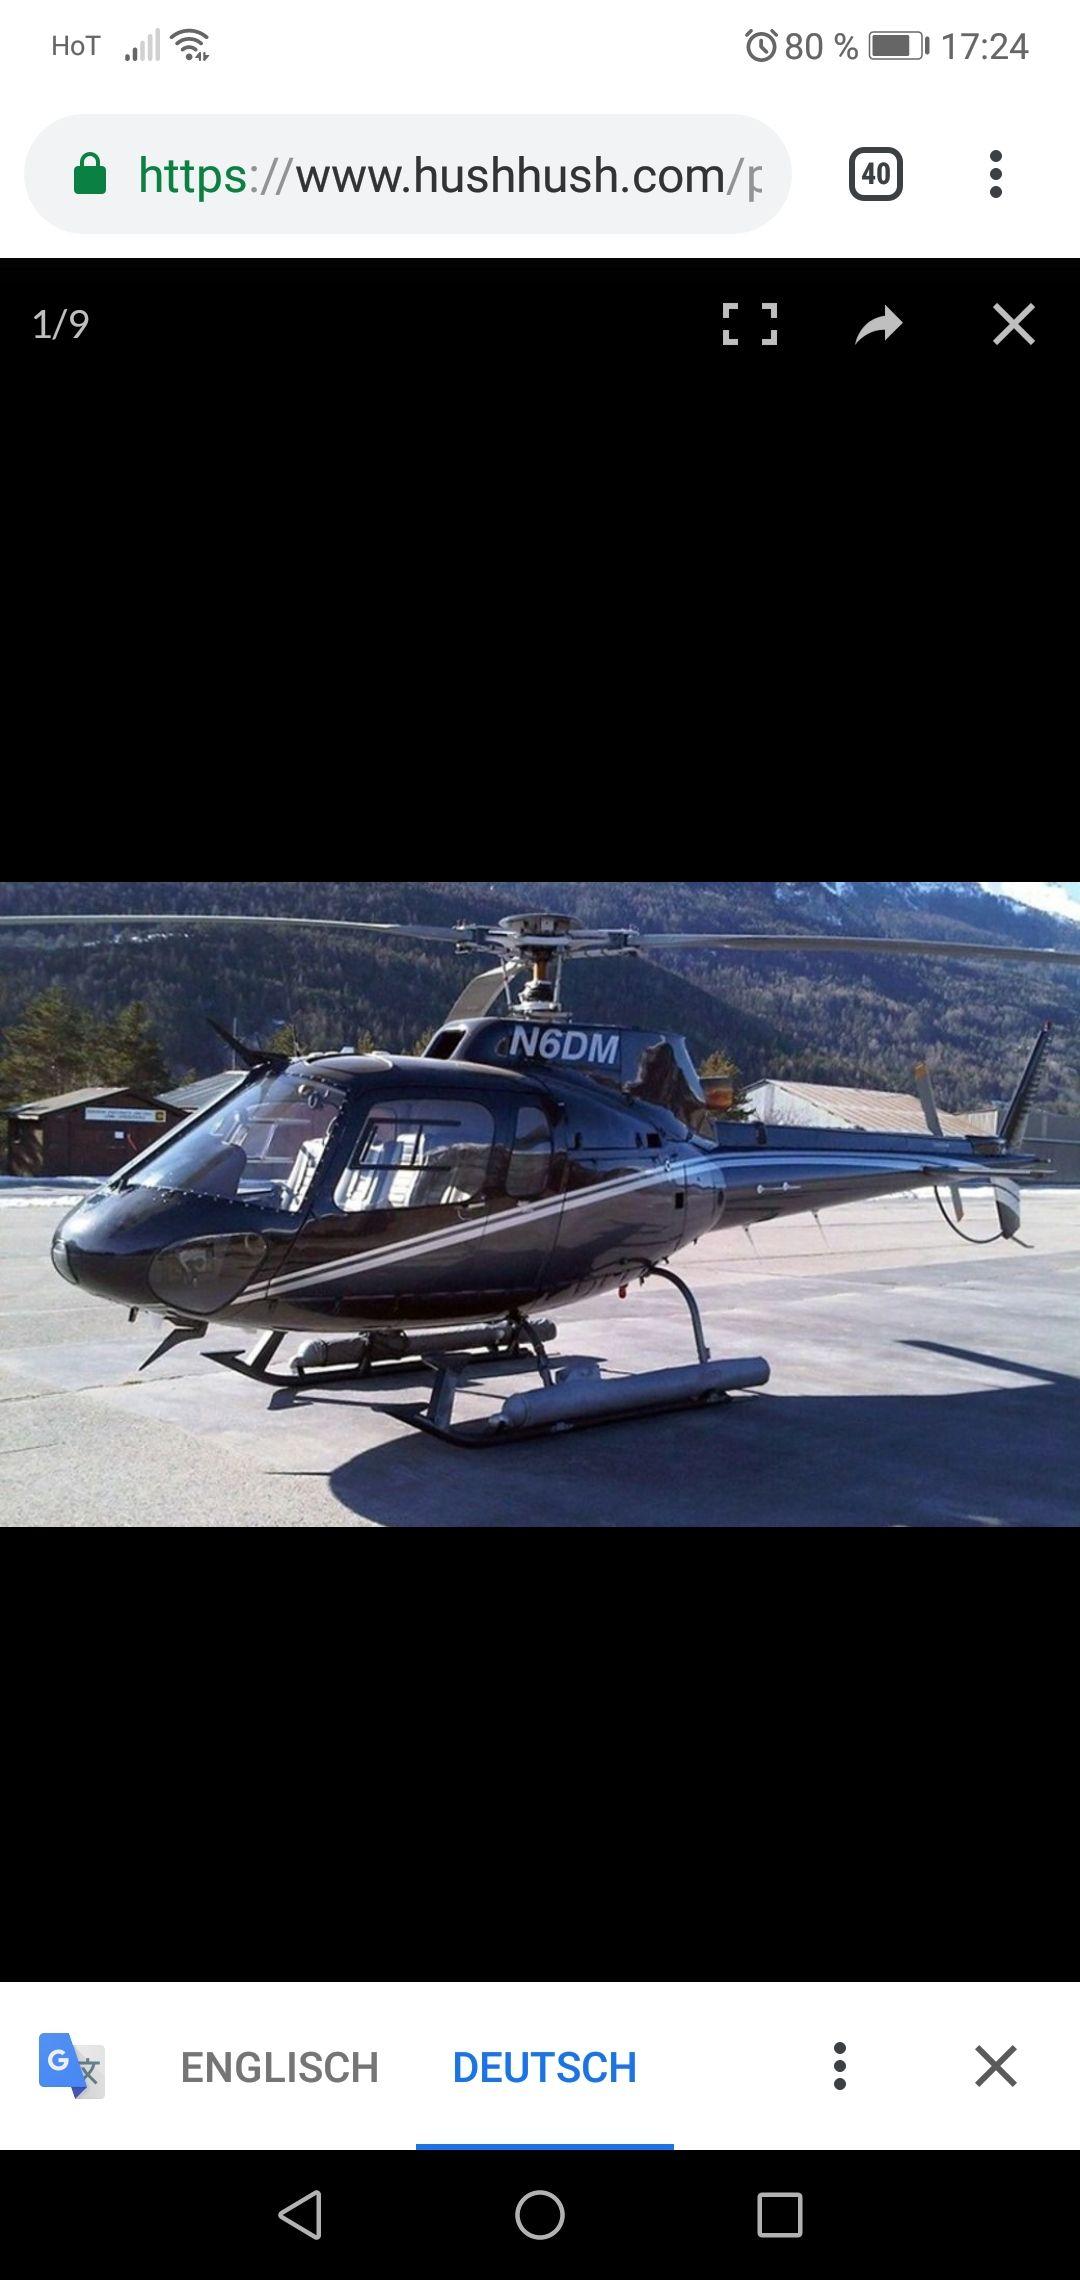 Helicopter Hubschrauber eurocopter